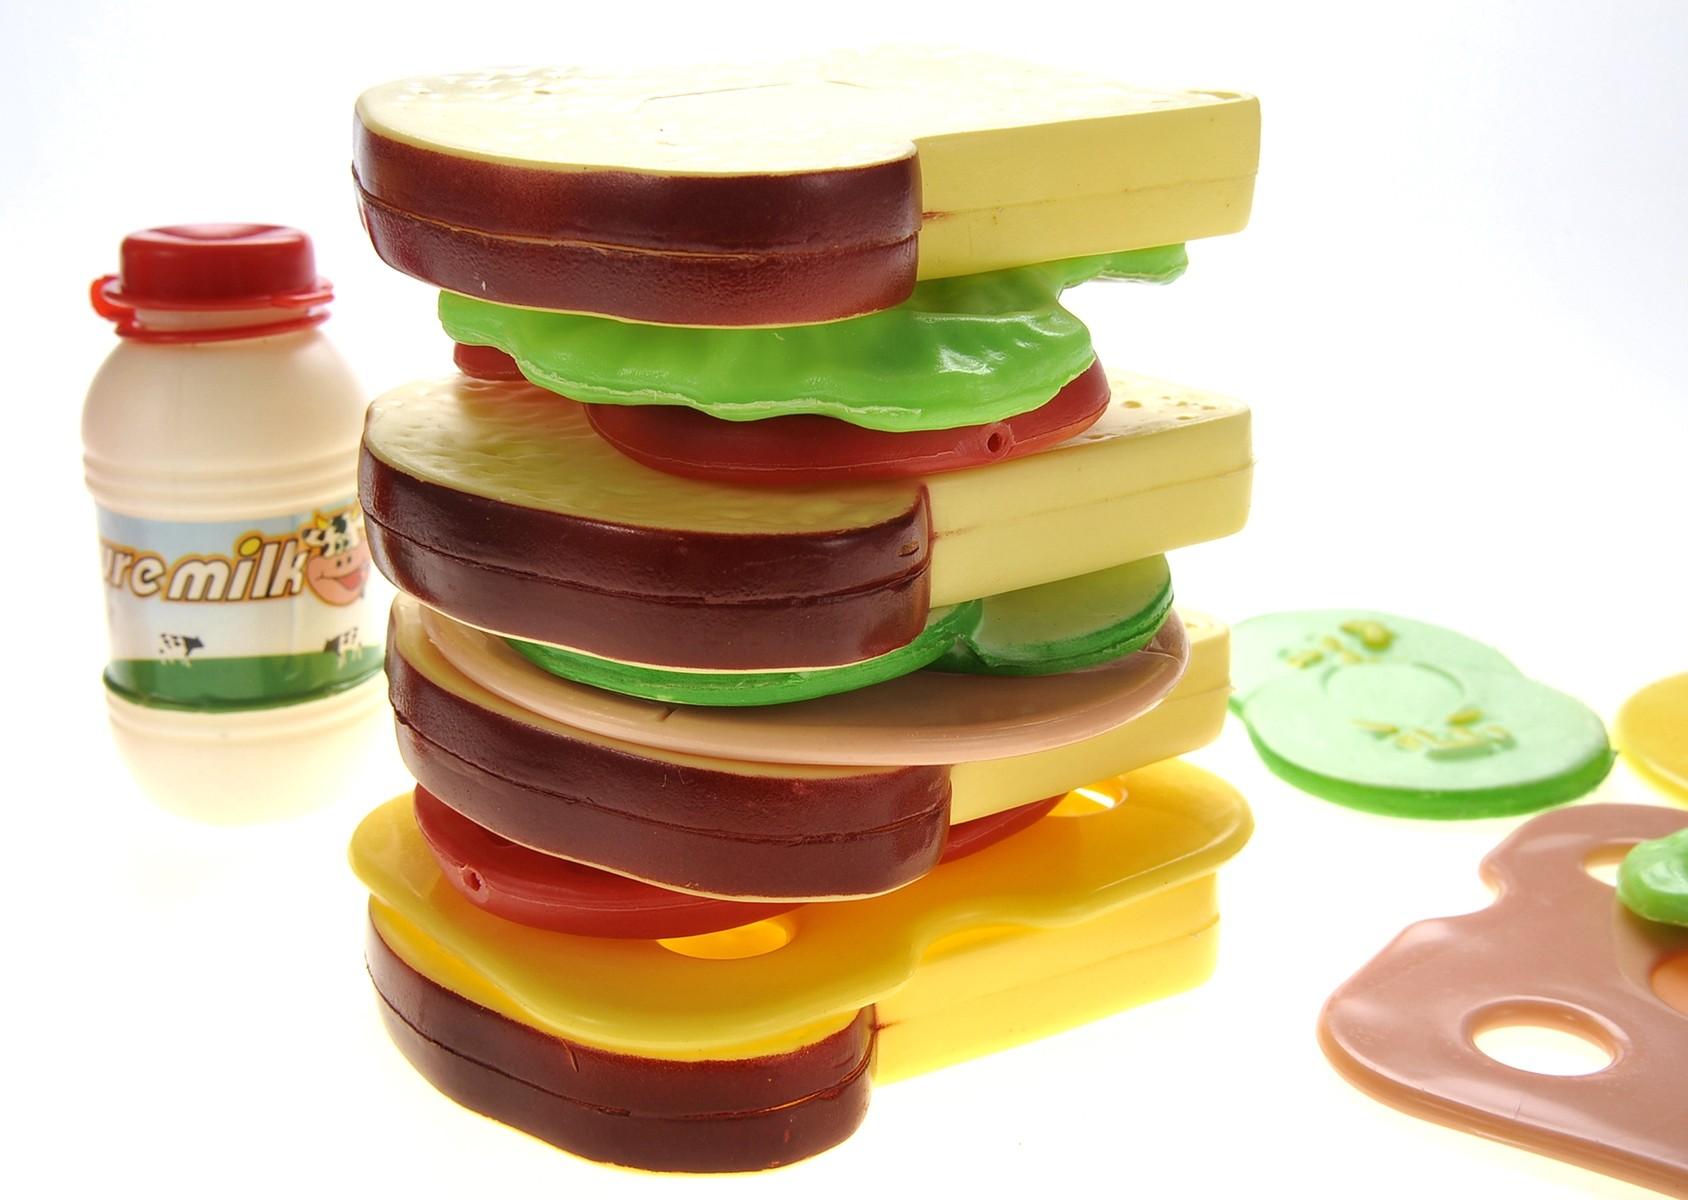 16pcs Country Club Sandwich Playset